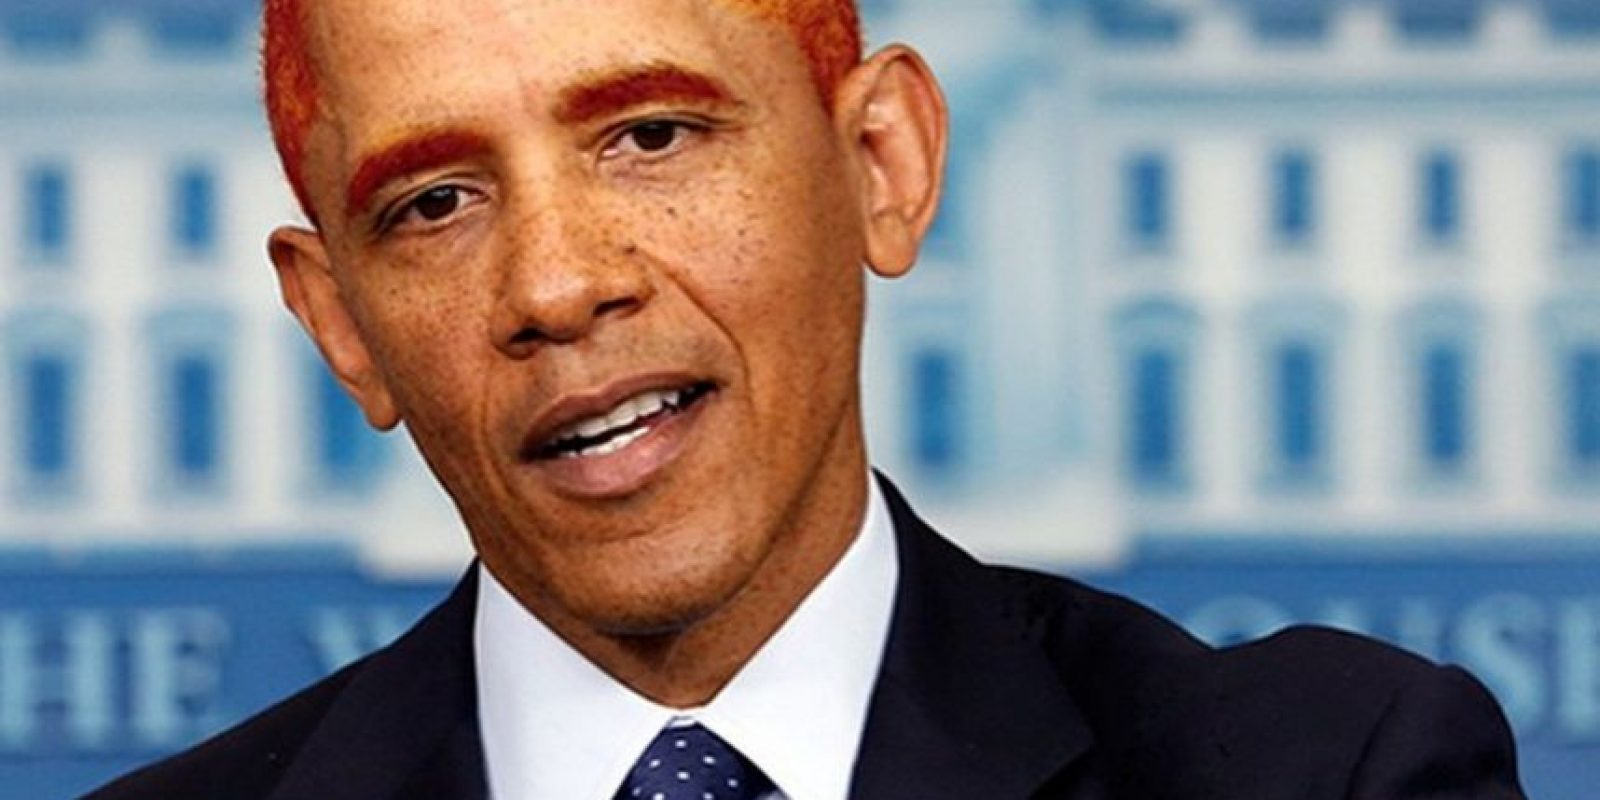 Barack Obama Foto:Vía instagram.com/putarangonit/